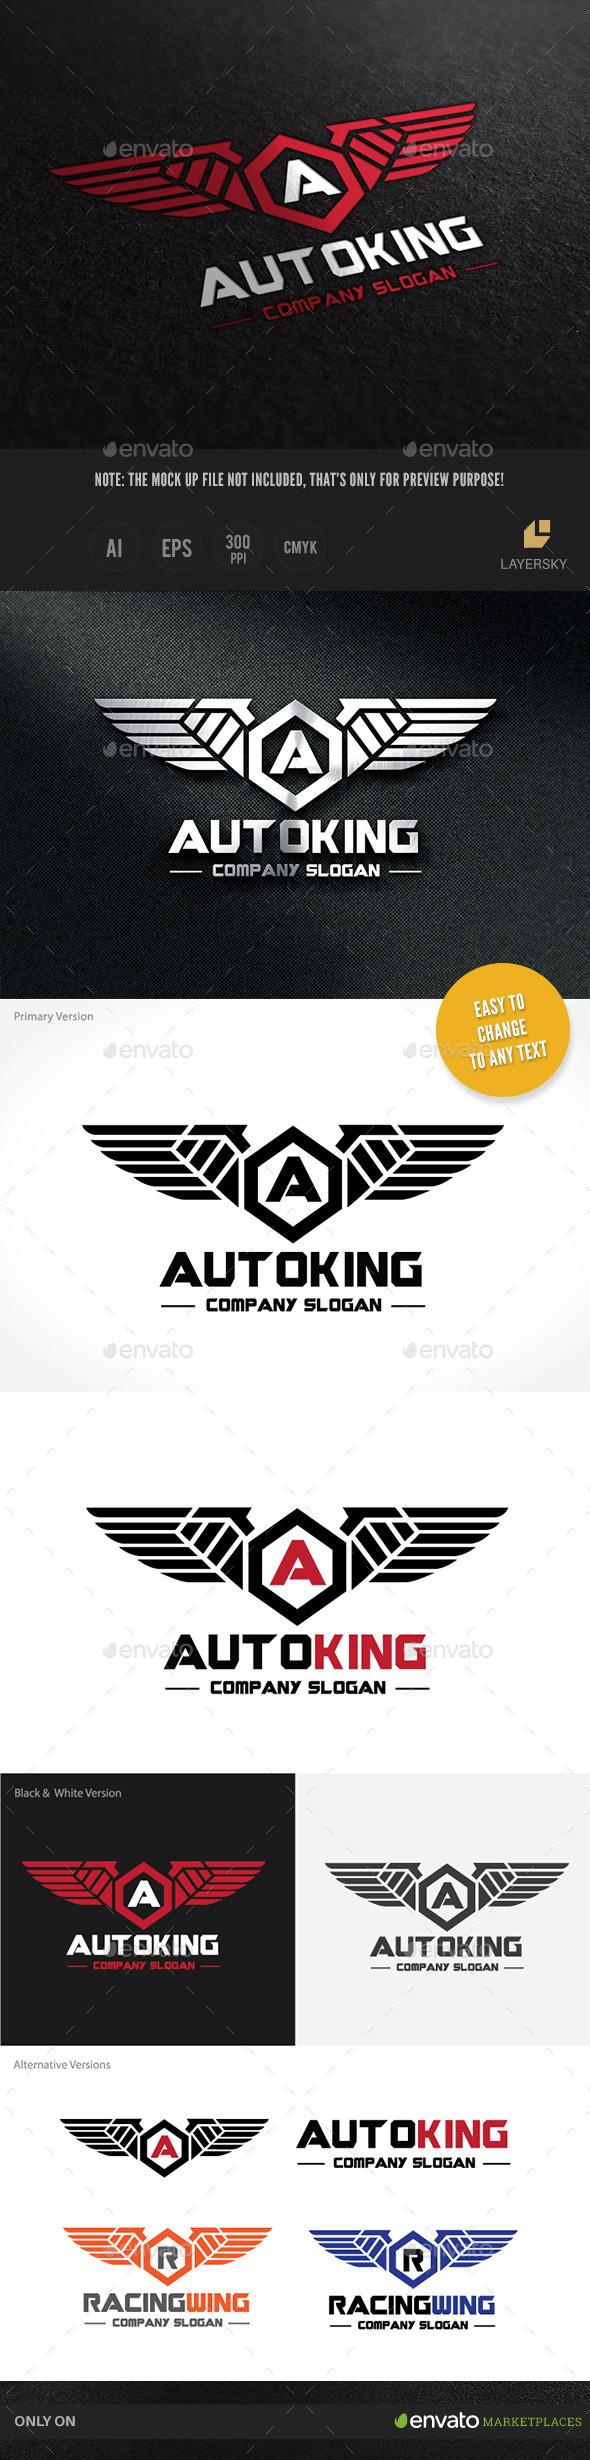 GraphicRiver Auto Kinng 10324165